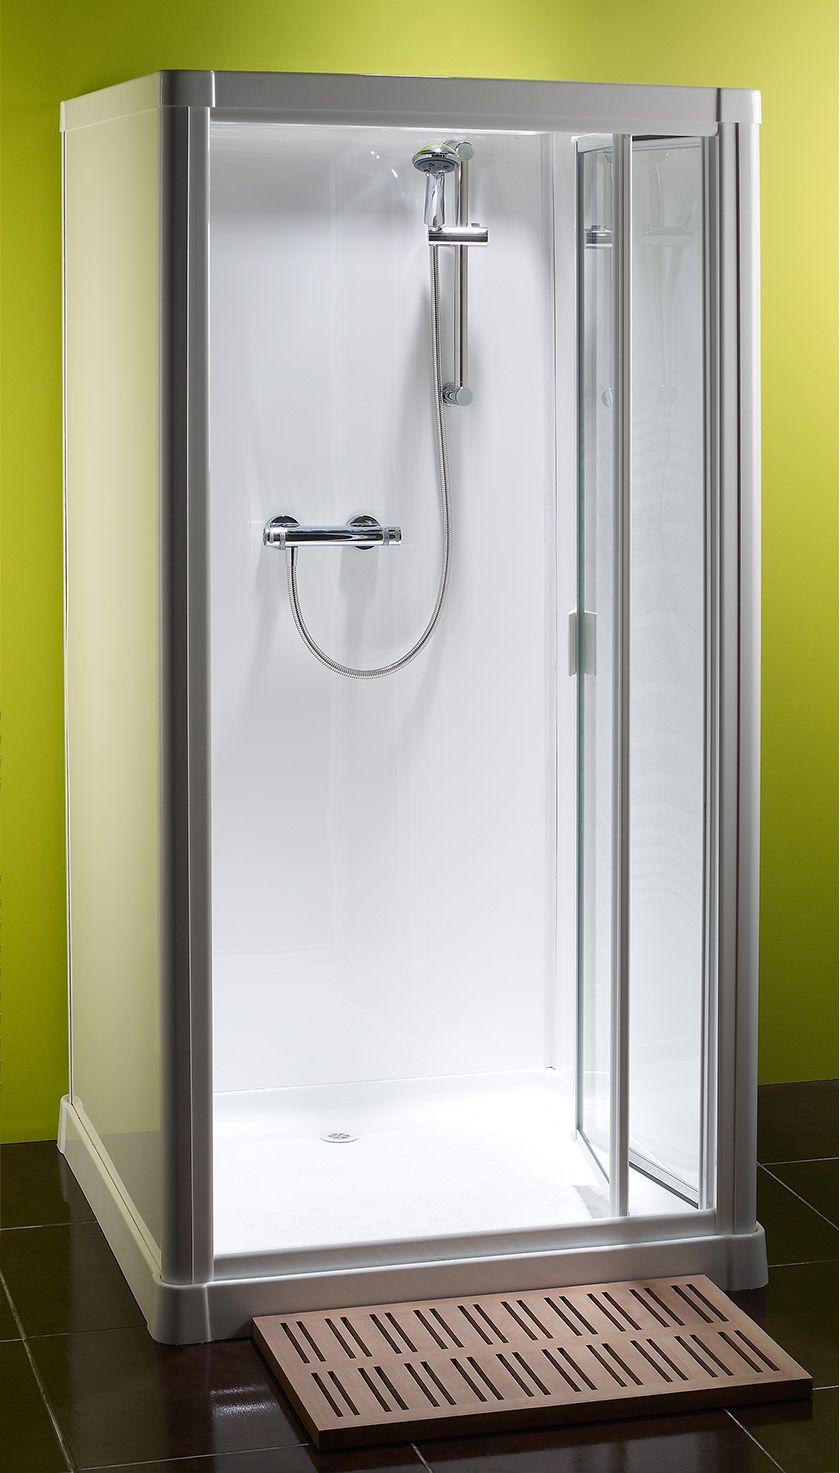 Kubex Profile 900 Leak Proof Shower Cubicle with Pivot Door 970mm x ...